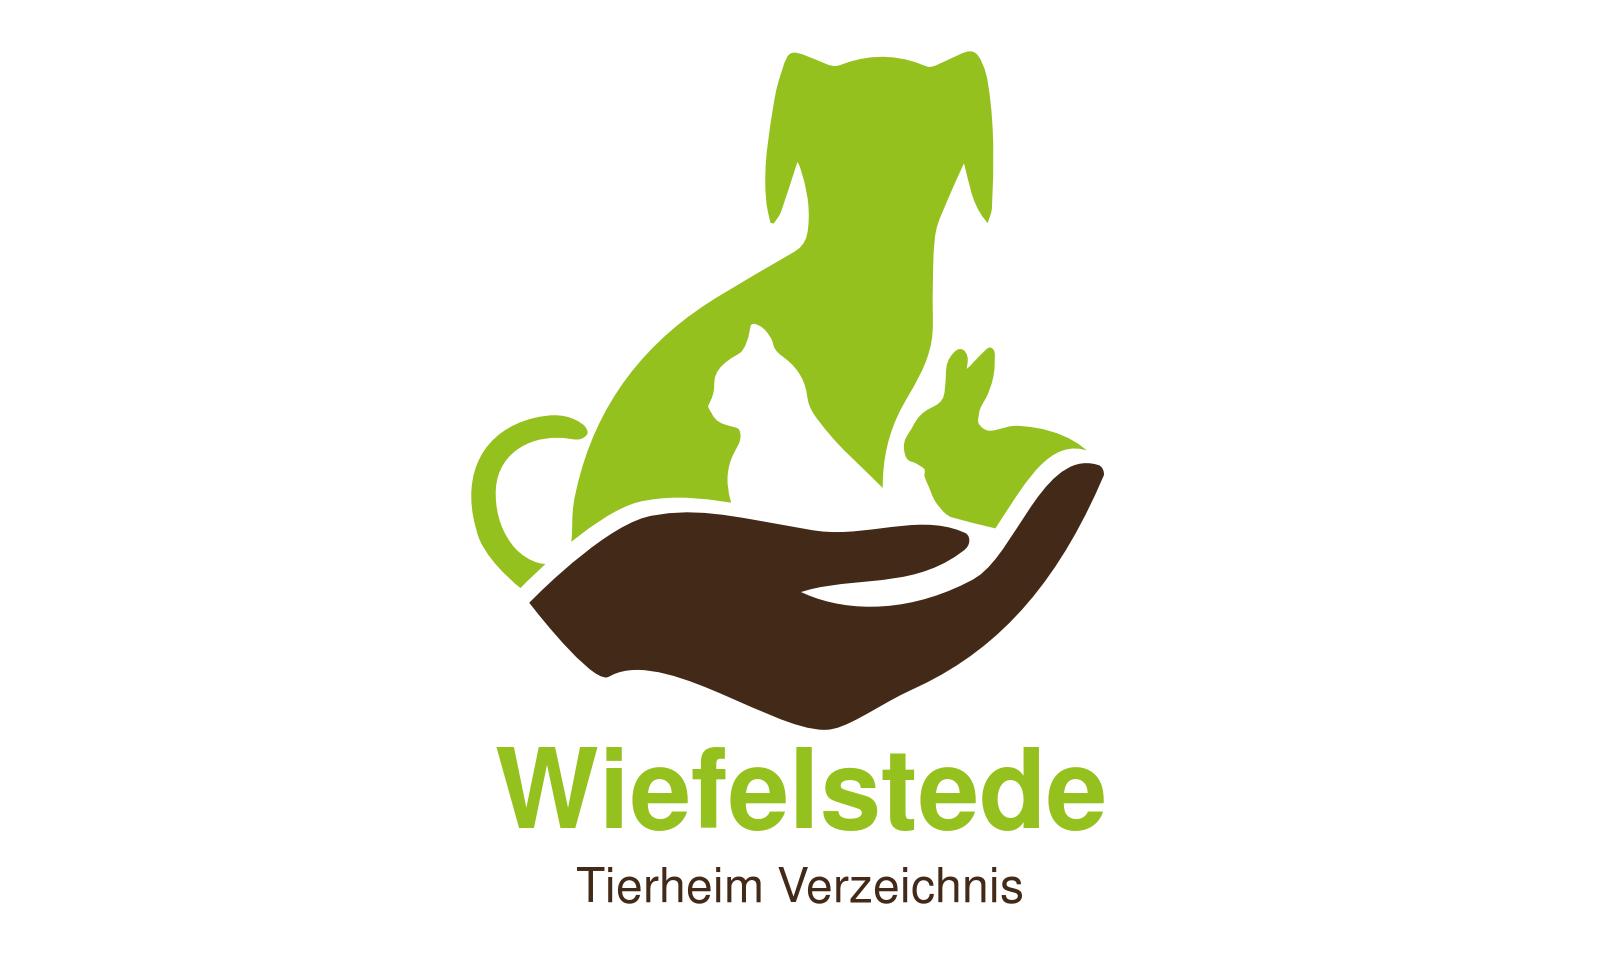 Tierheim Wiefelstede